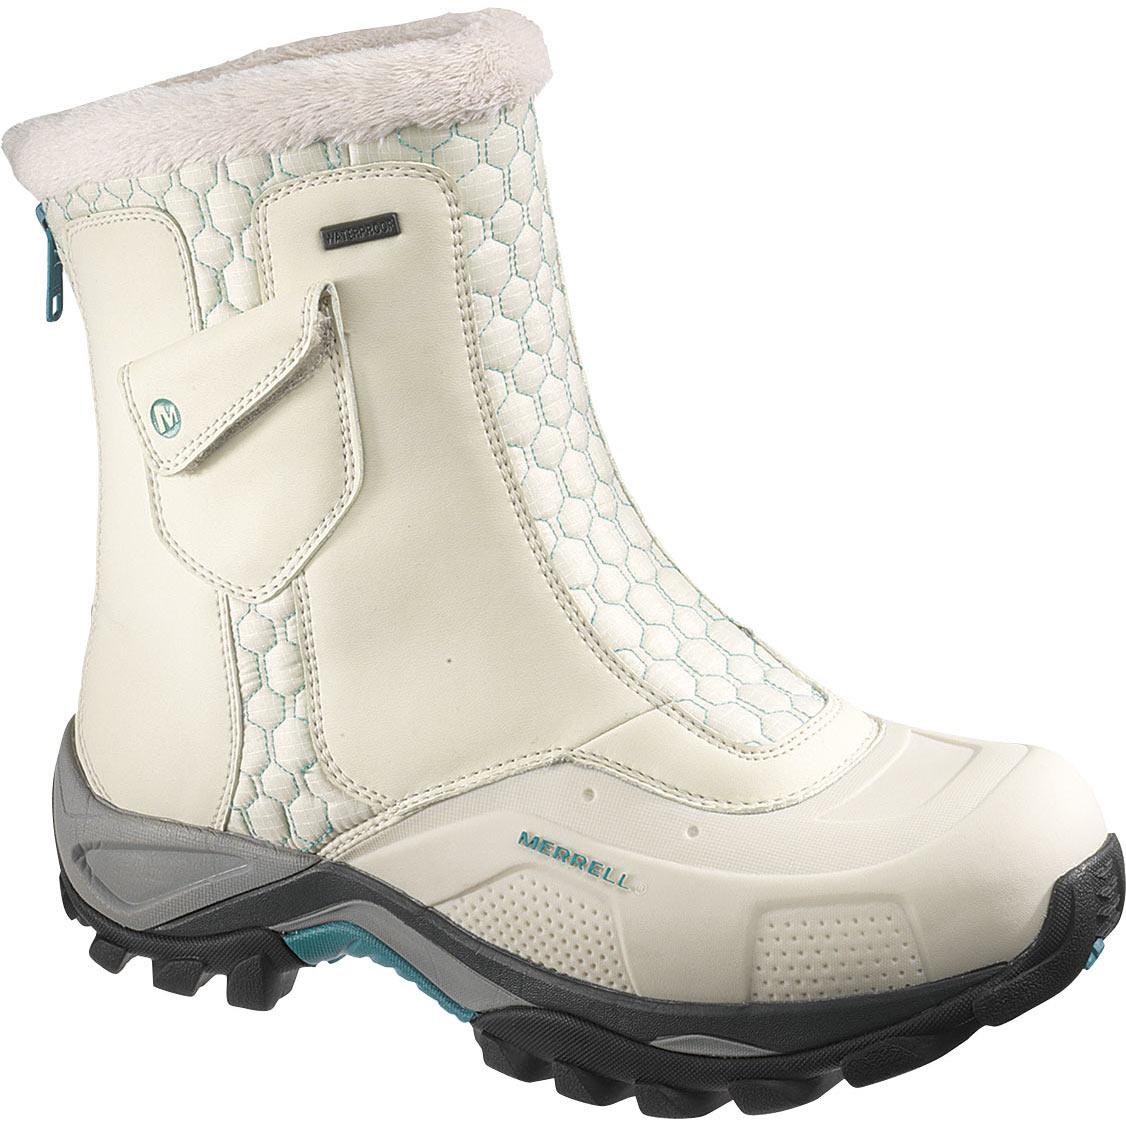 Merrell Whiteout ZIP Waterproof 55604 EUR 37